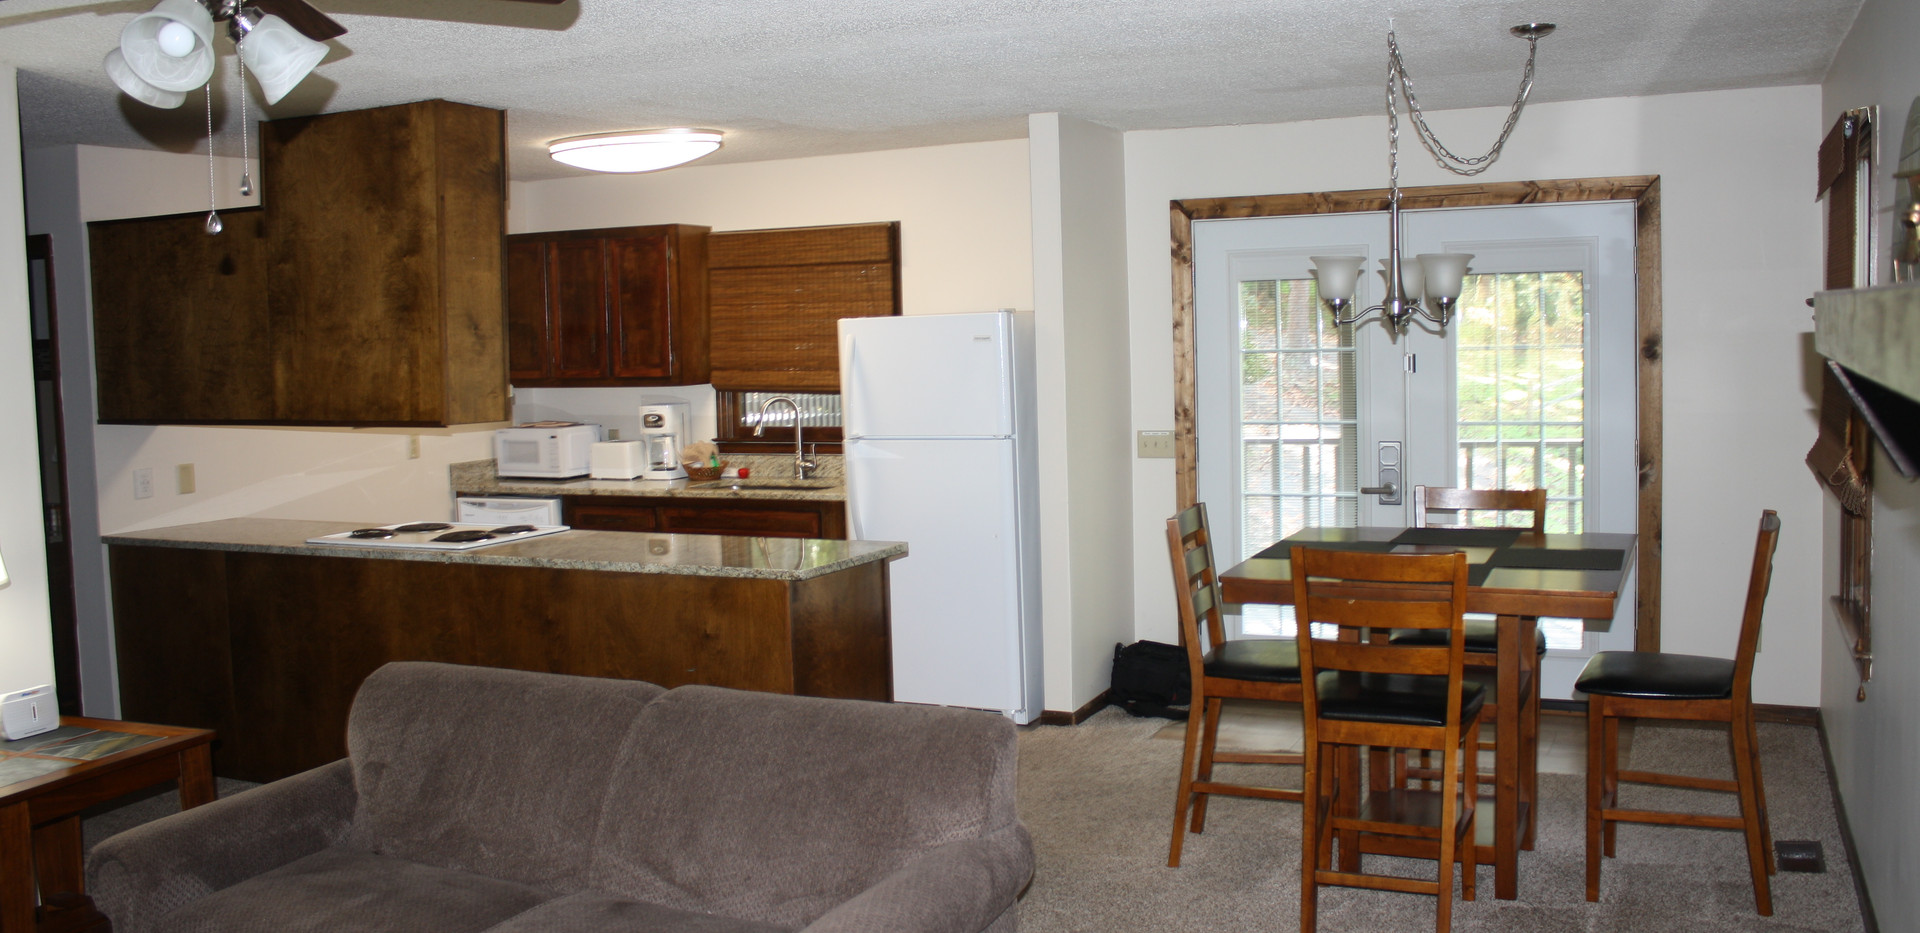 1C Kitchen & Dining Room